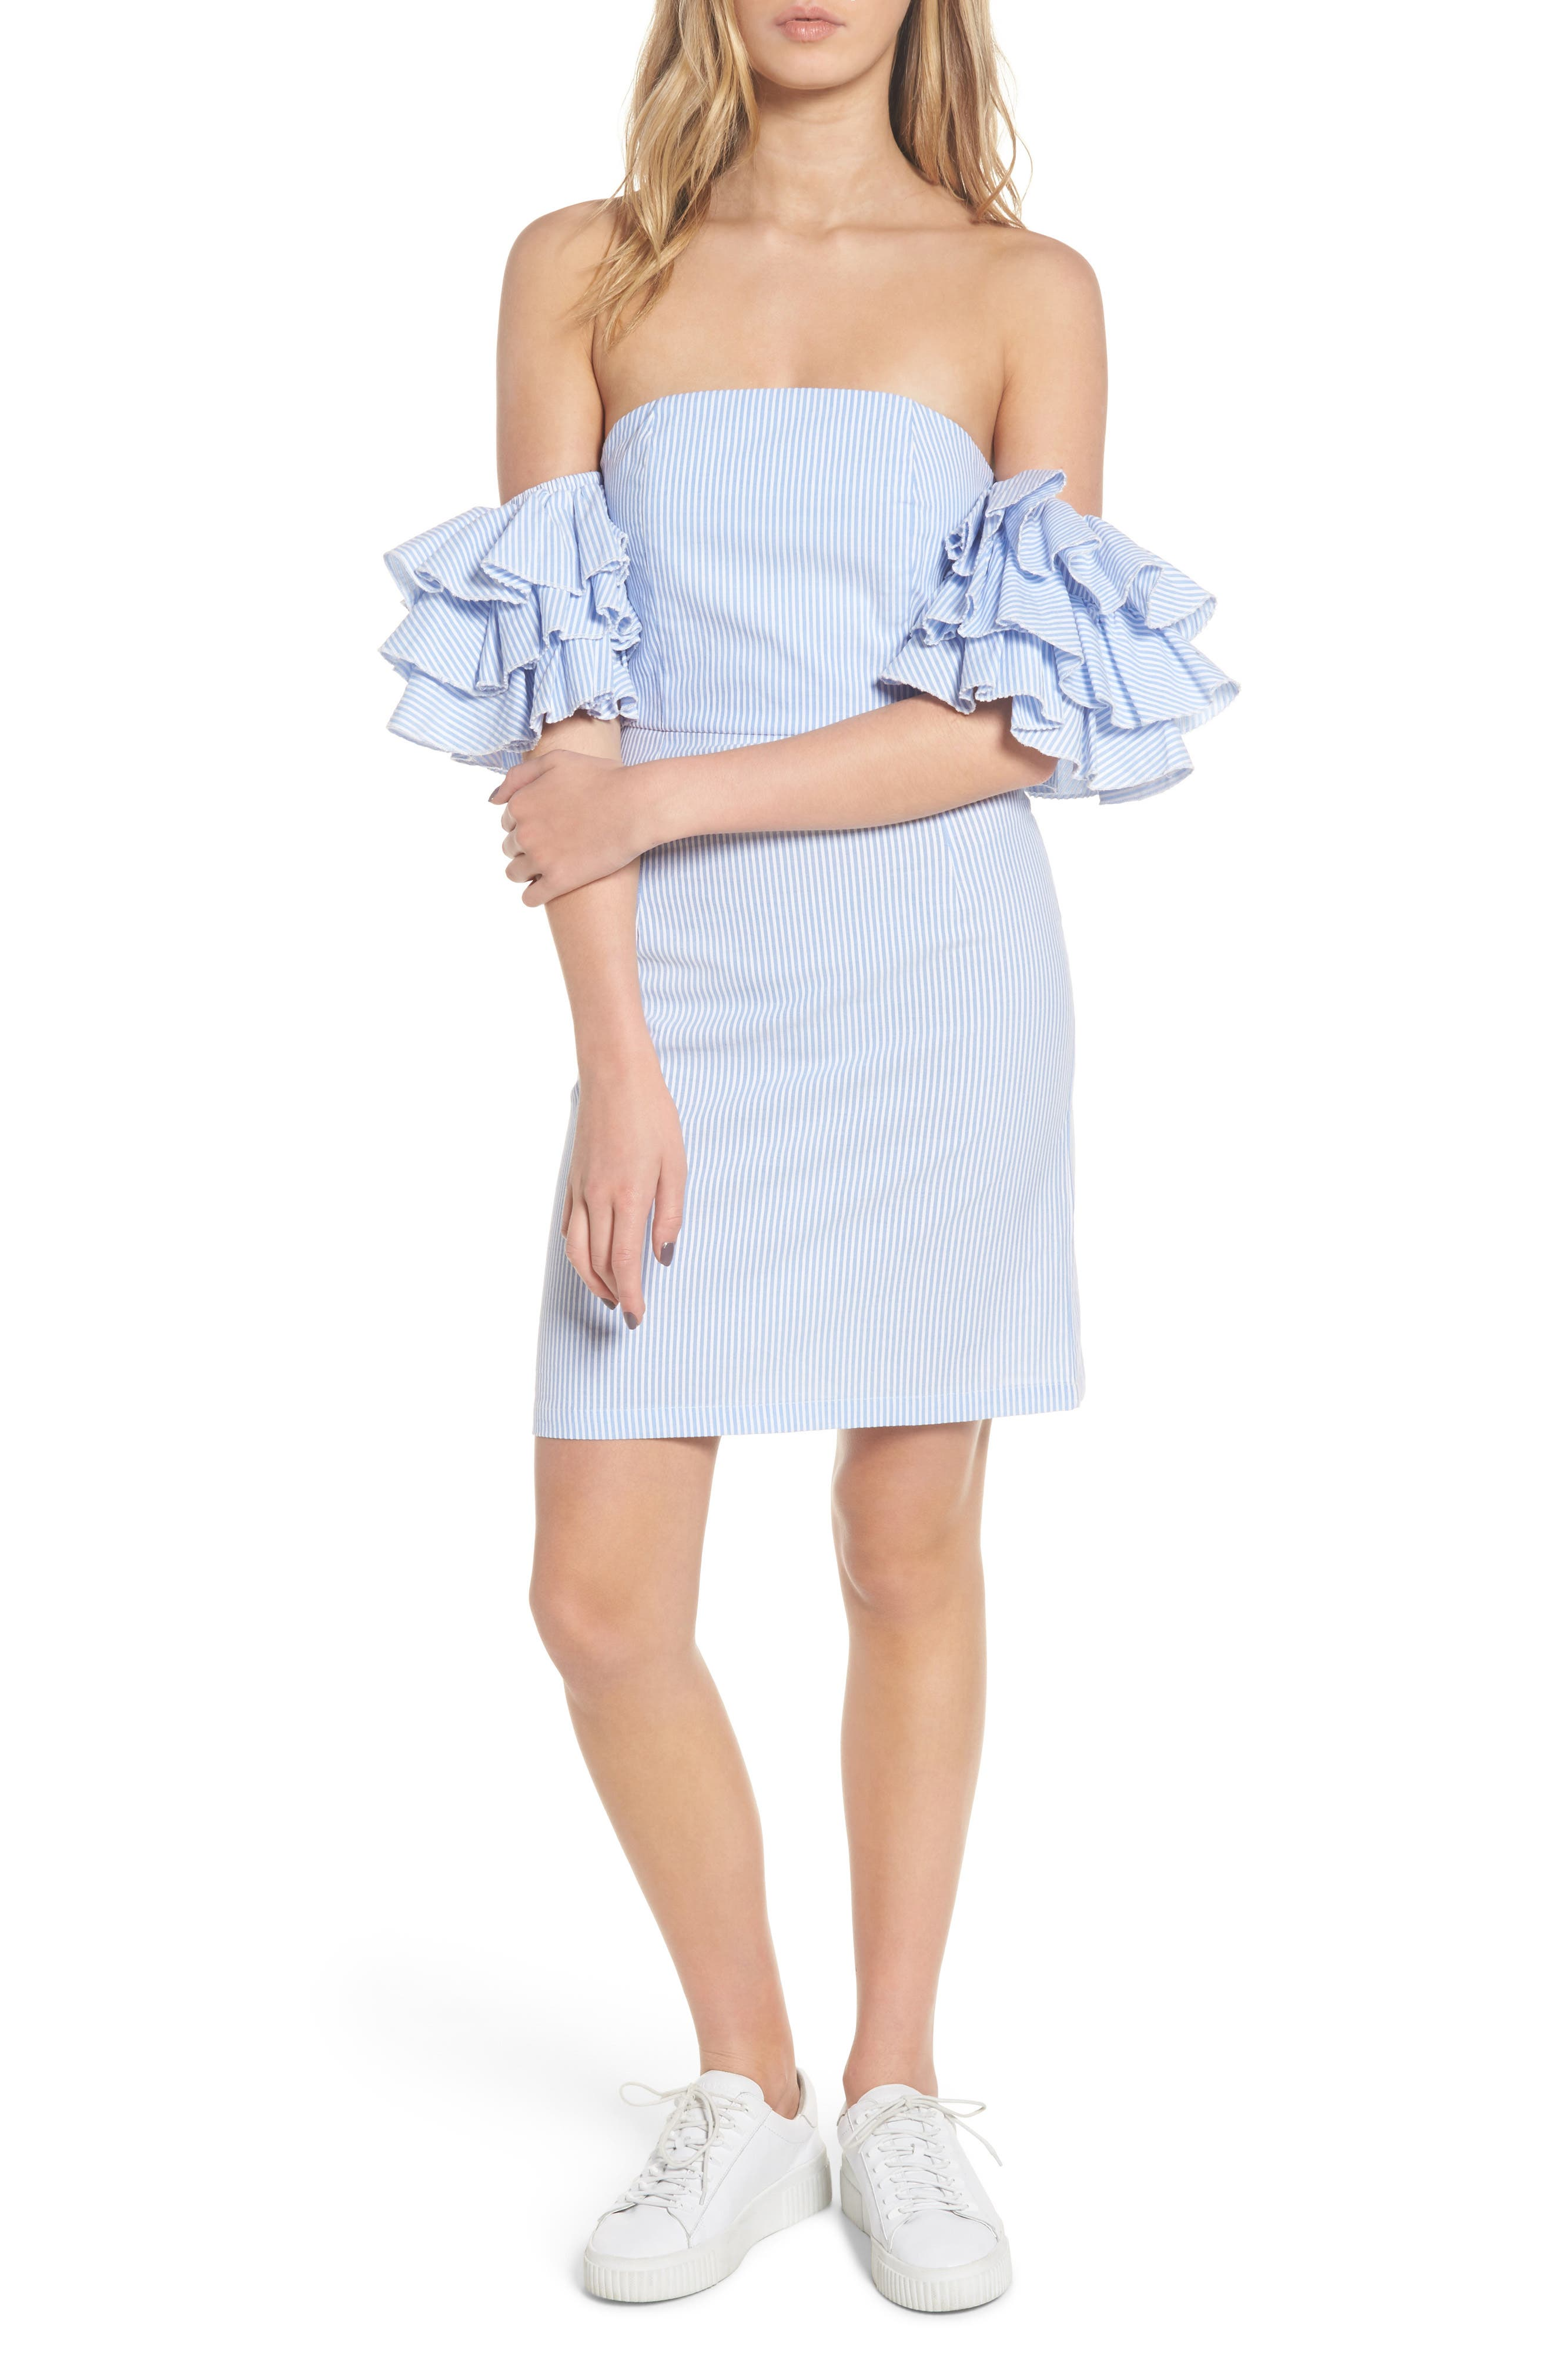 The Malibu Off the Shoulder Dress,                             Main thumbnail 1, color,                             Pinstriped Blue